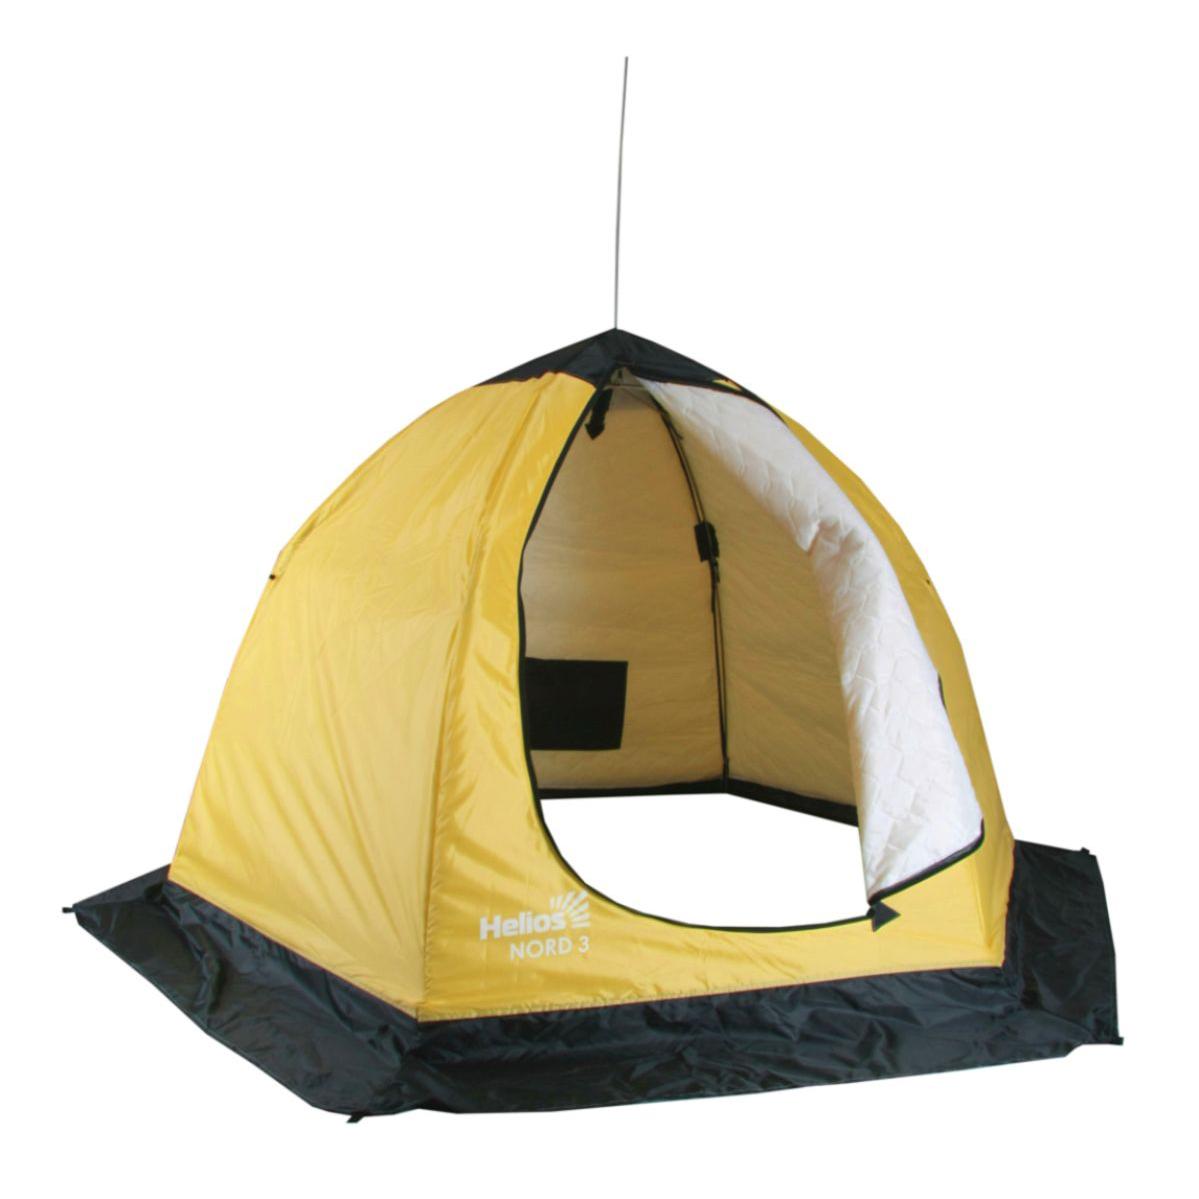 Палатка-зонт зимняя утепленная NORD-3 Helios (3-местная), Палатки для охоты и рыбалки - арт. 1128270375